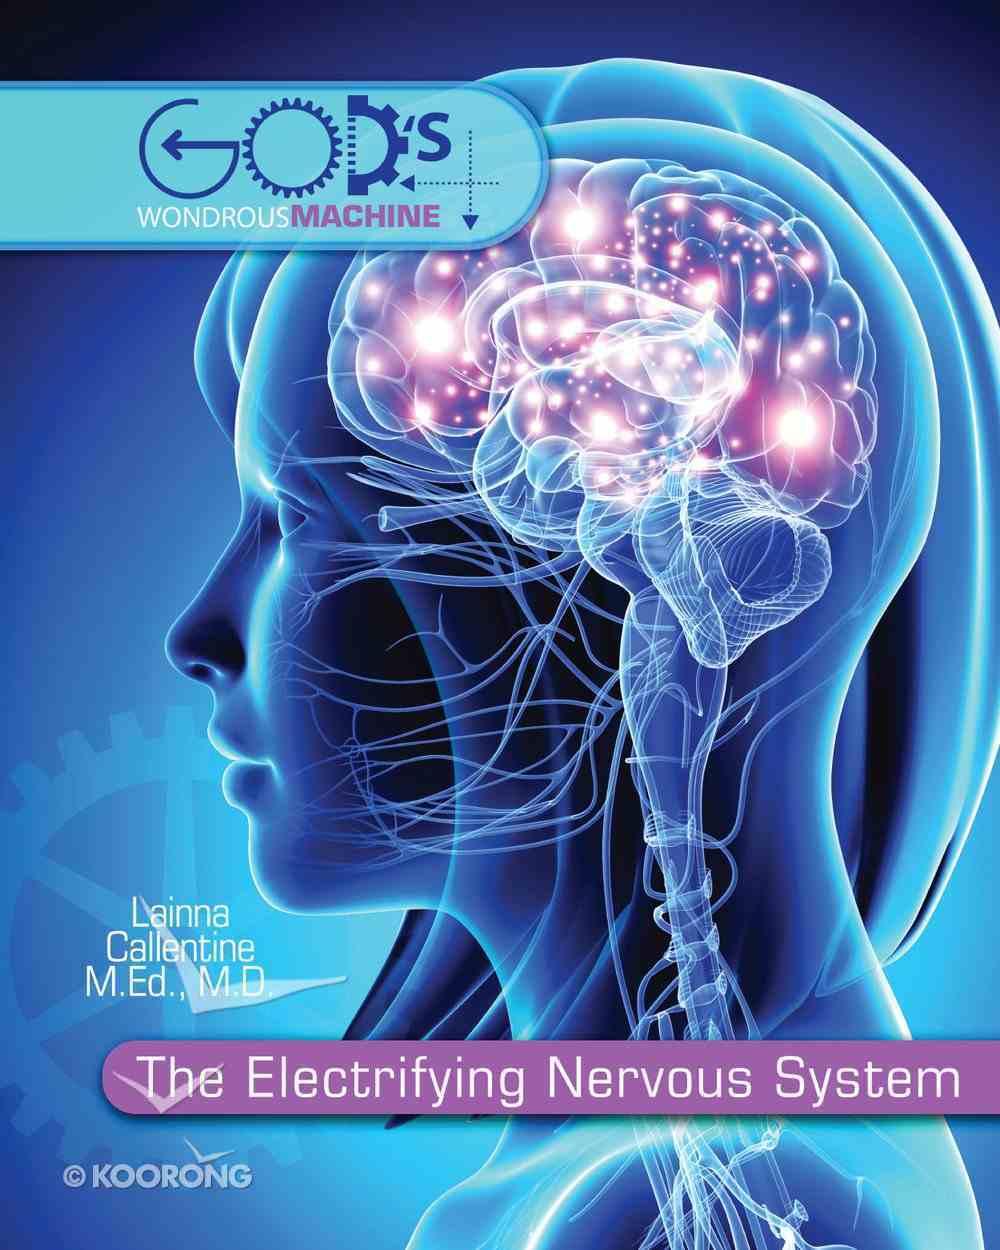 Electrifying Nervous System (God's Wondrous Machine Series) eBook